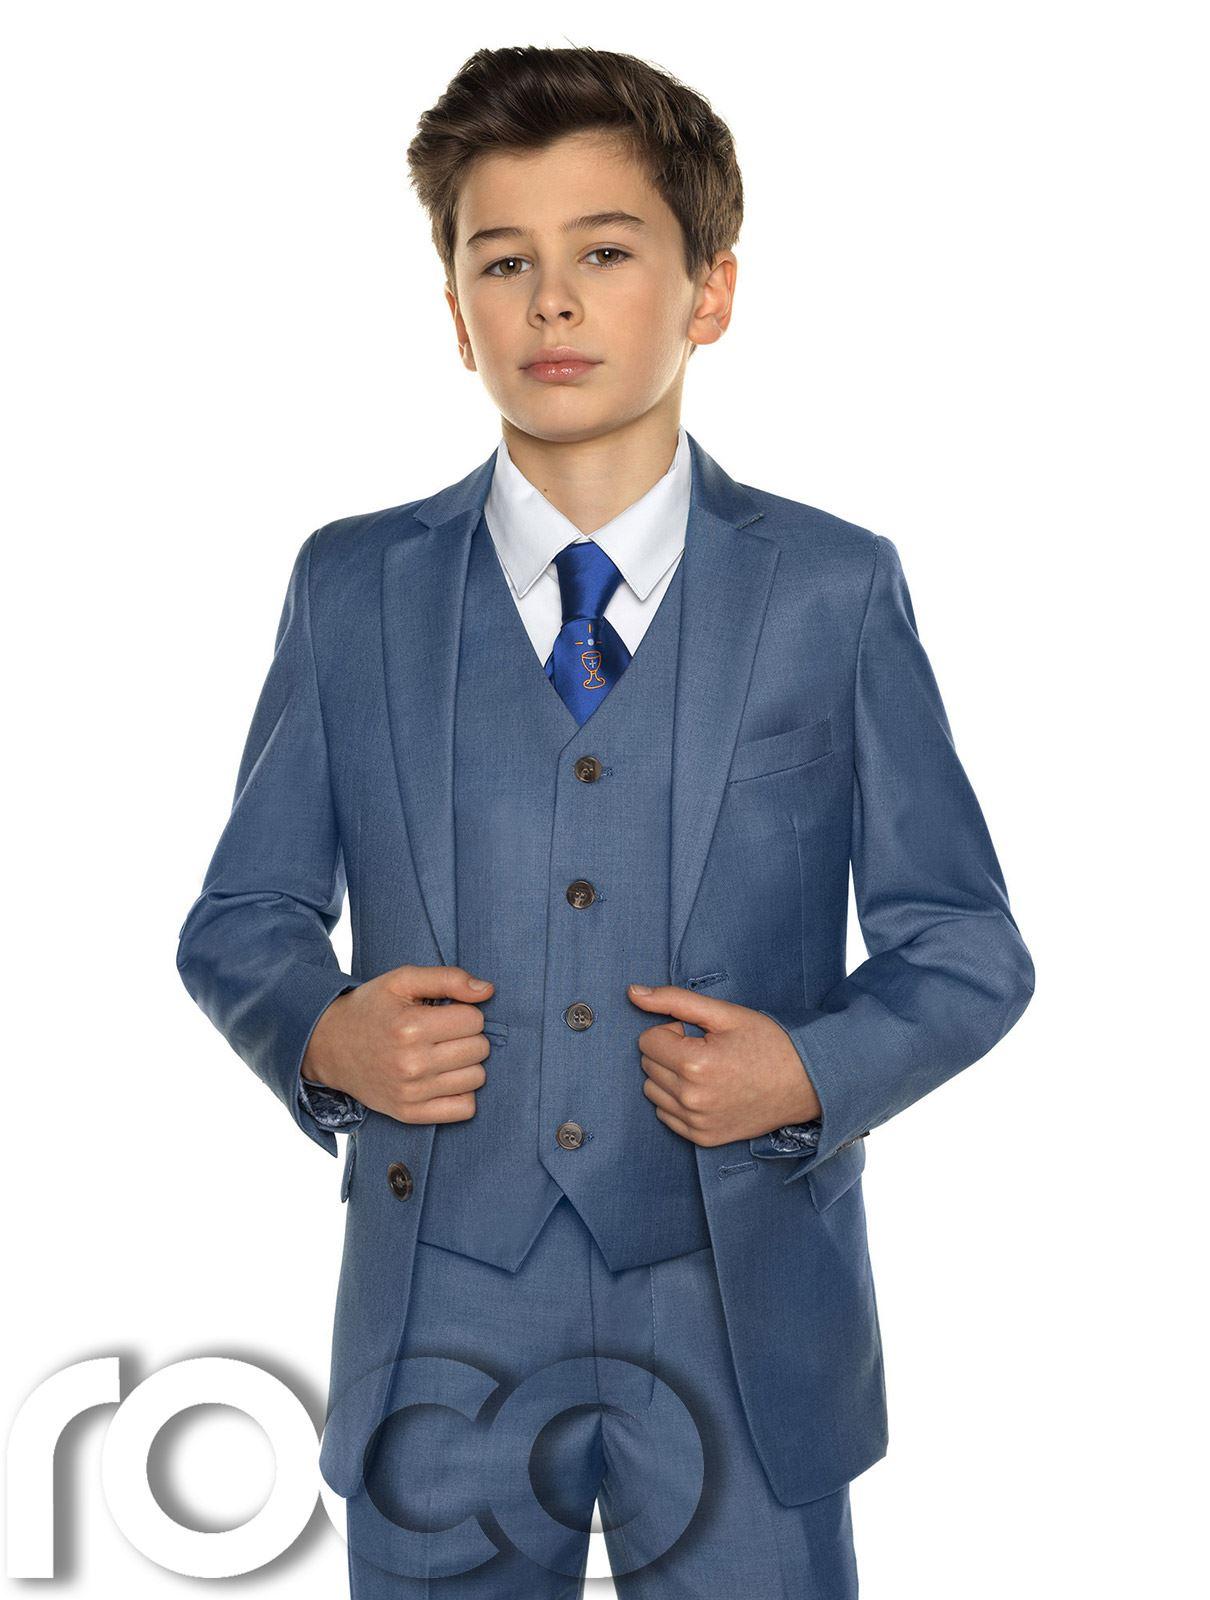 Jungen Chambray-anzug, Heilige Kommunion Anzug, Chambray